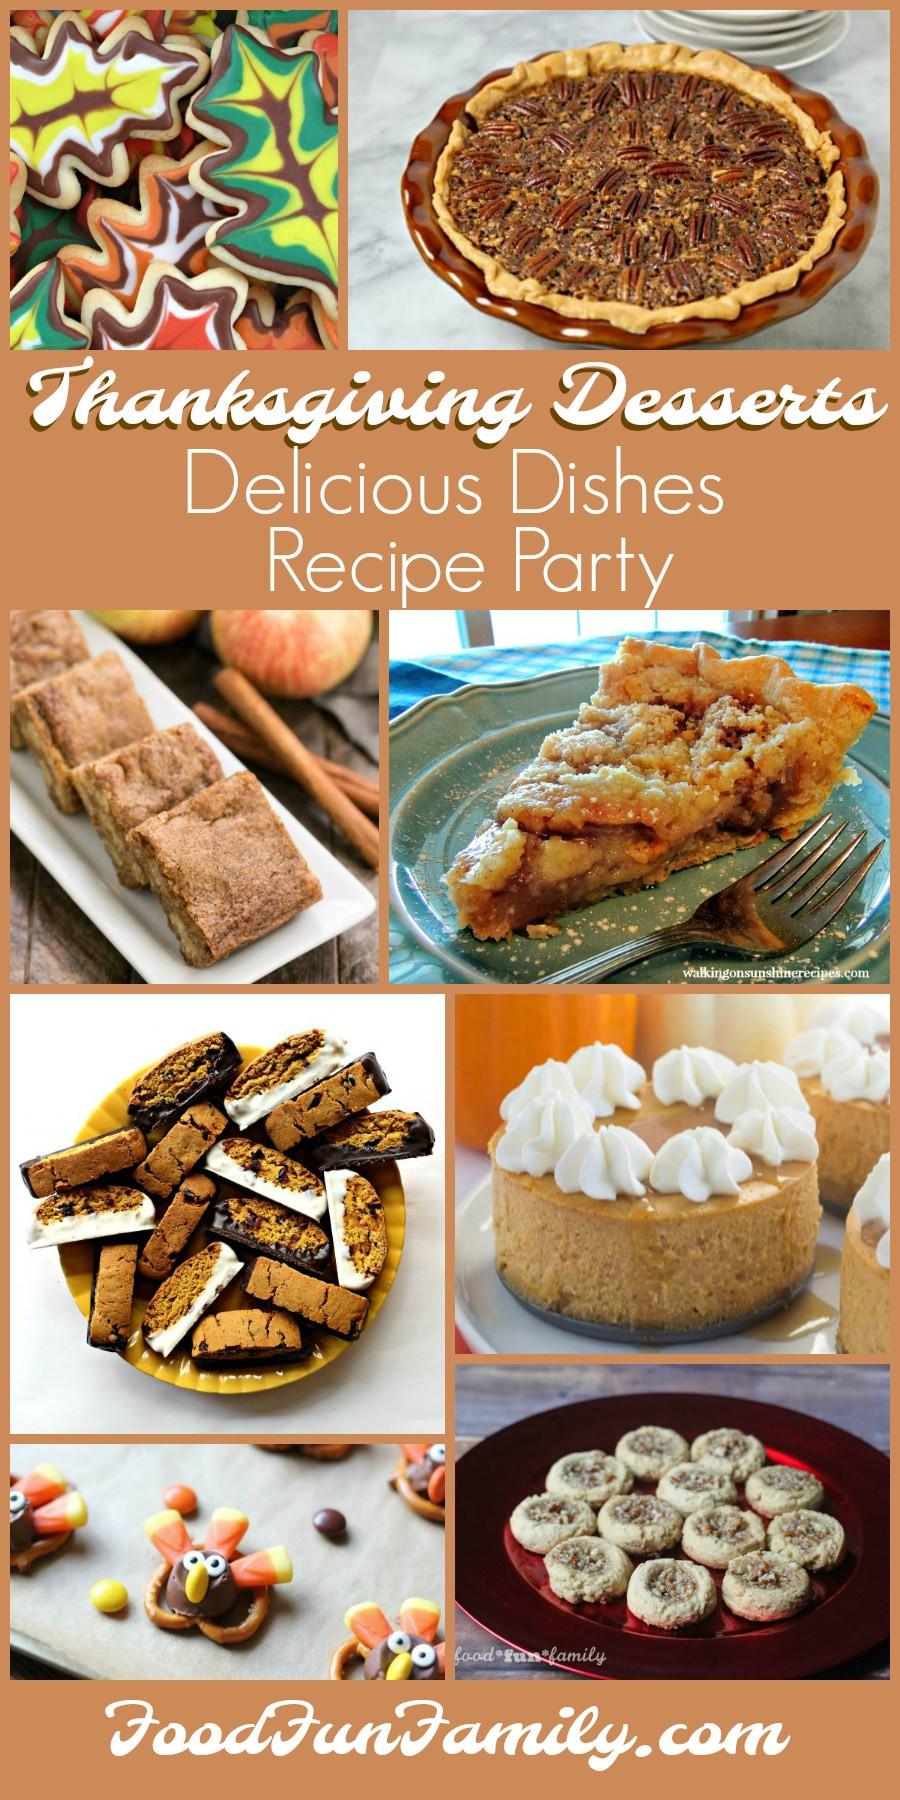 Pinterest Thanksgiving Desserts  Thanksgiving Dessert Recipes – Delicious Dishes Recipe